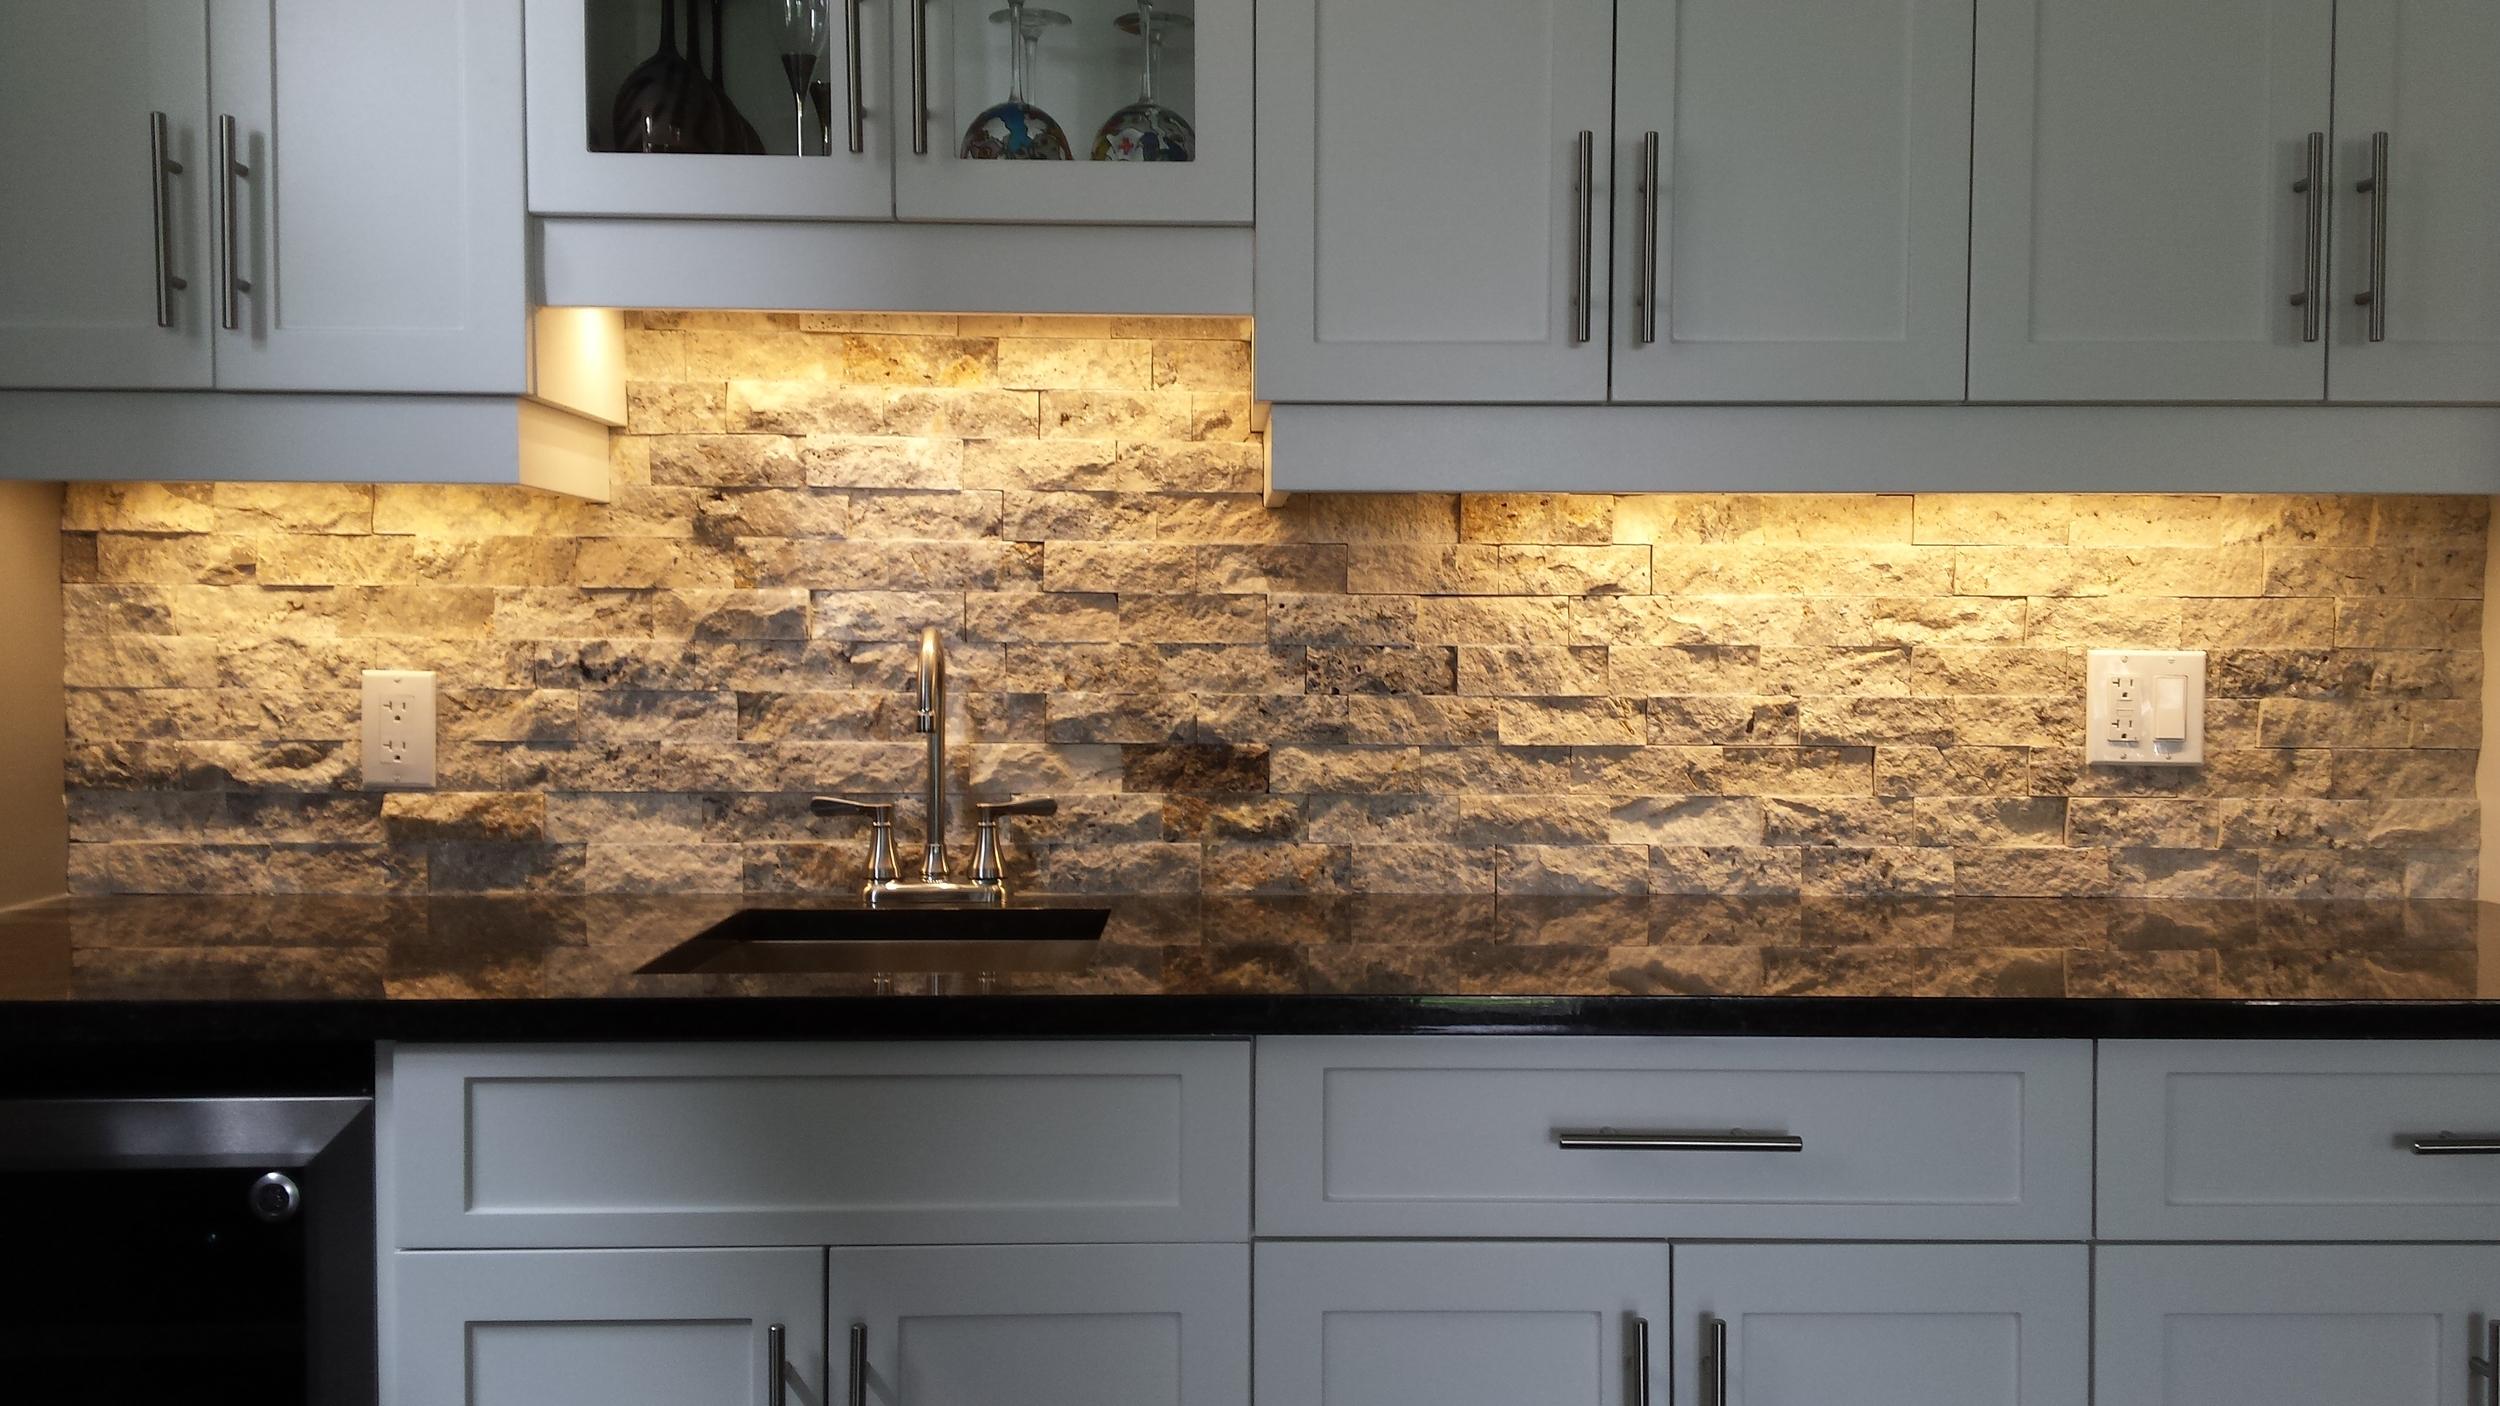 Tile Contractors Work - Kitchen Backsplash (11).jpg